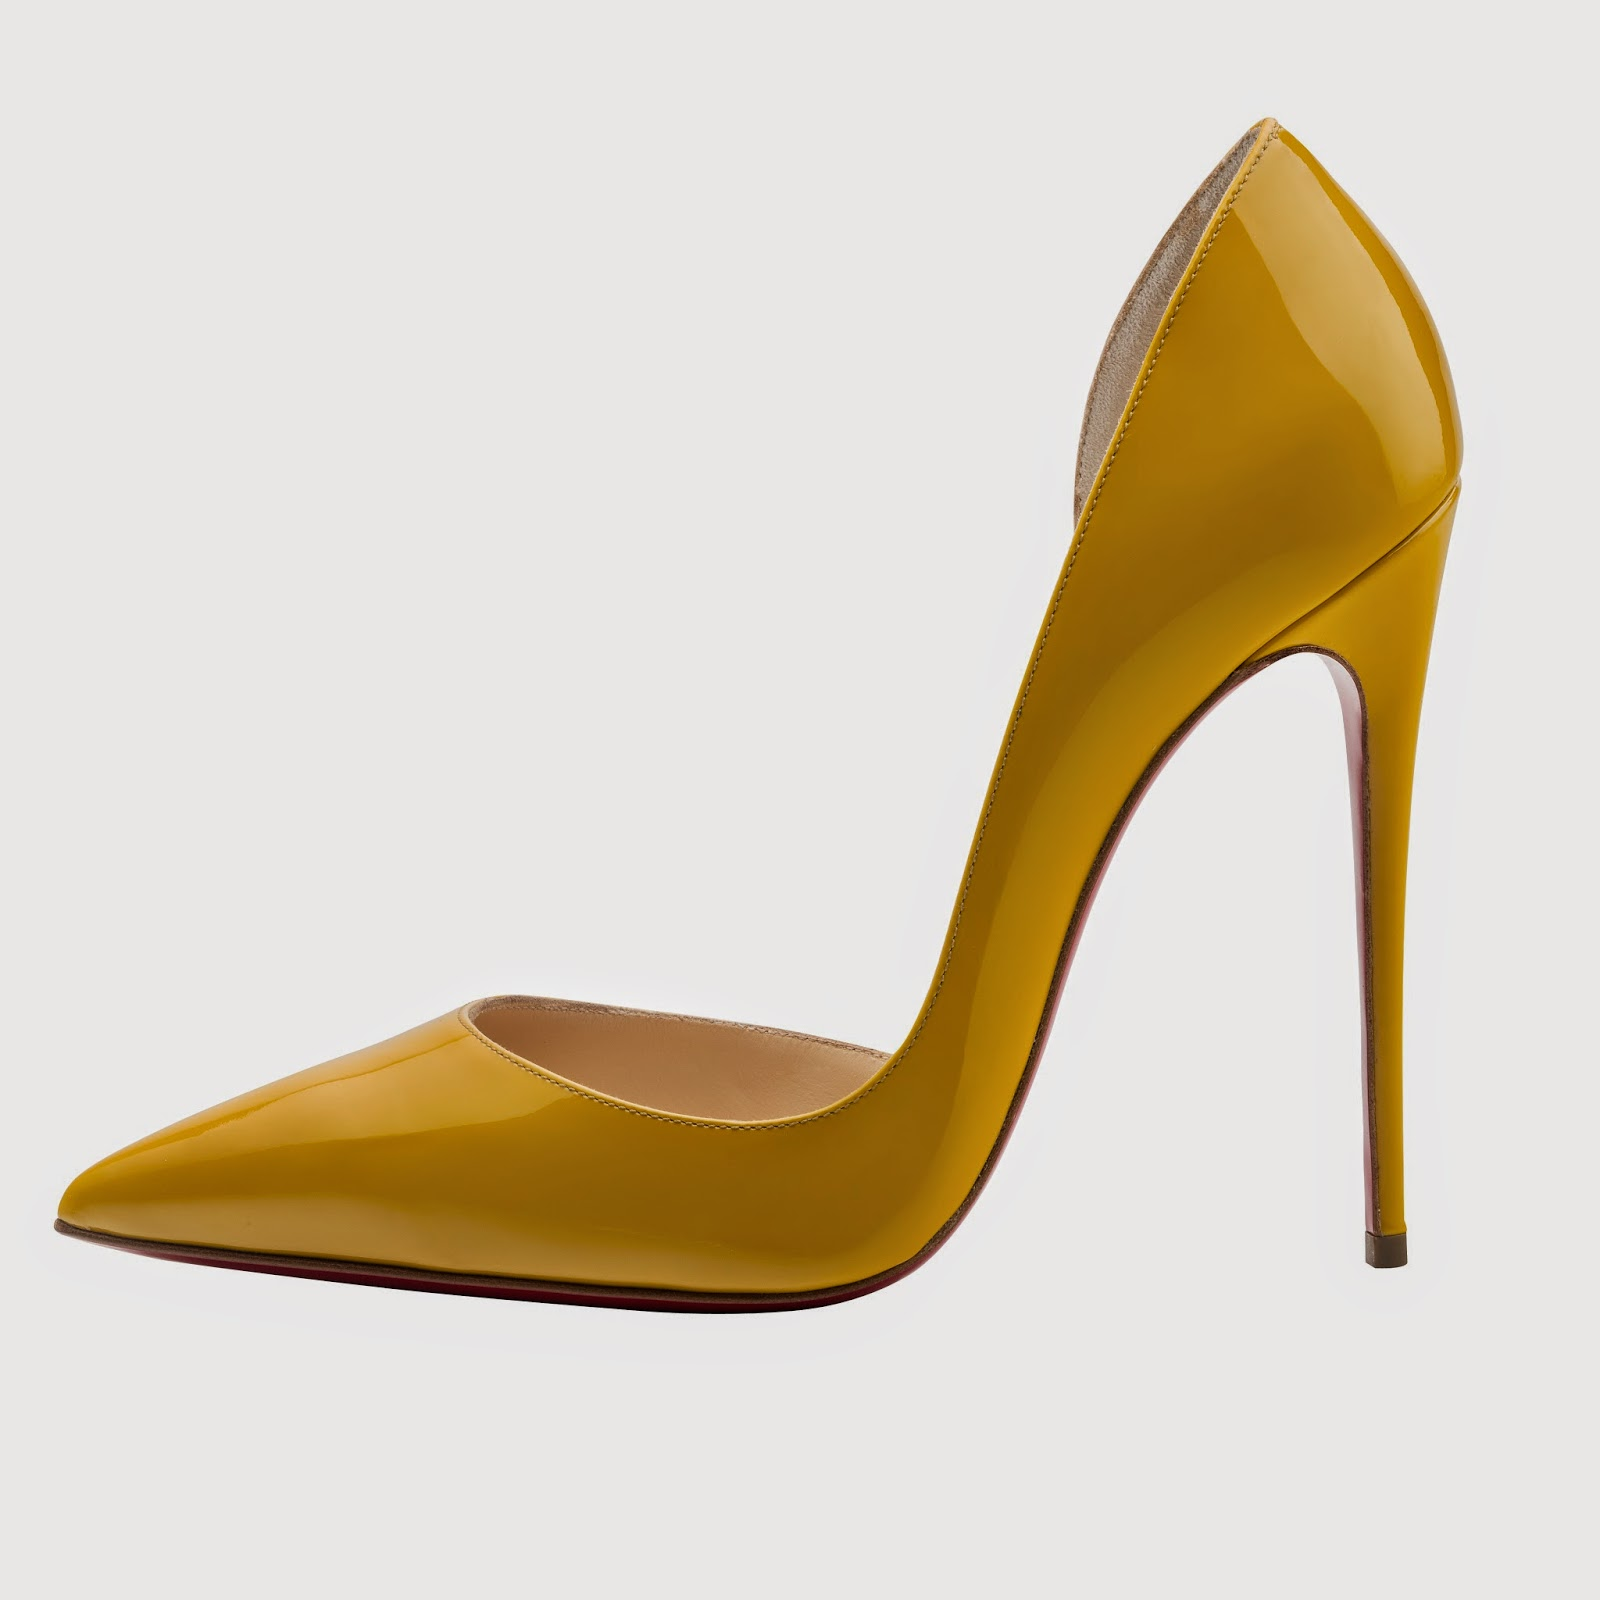 Christian Louboutin Iriza 120 Patent Epi d'Or